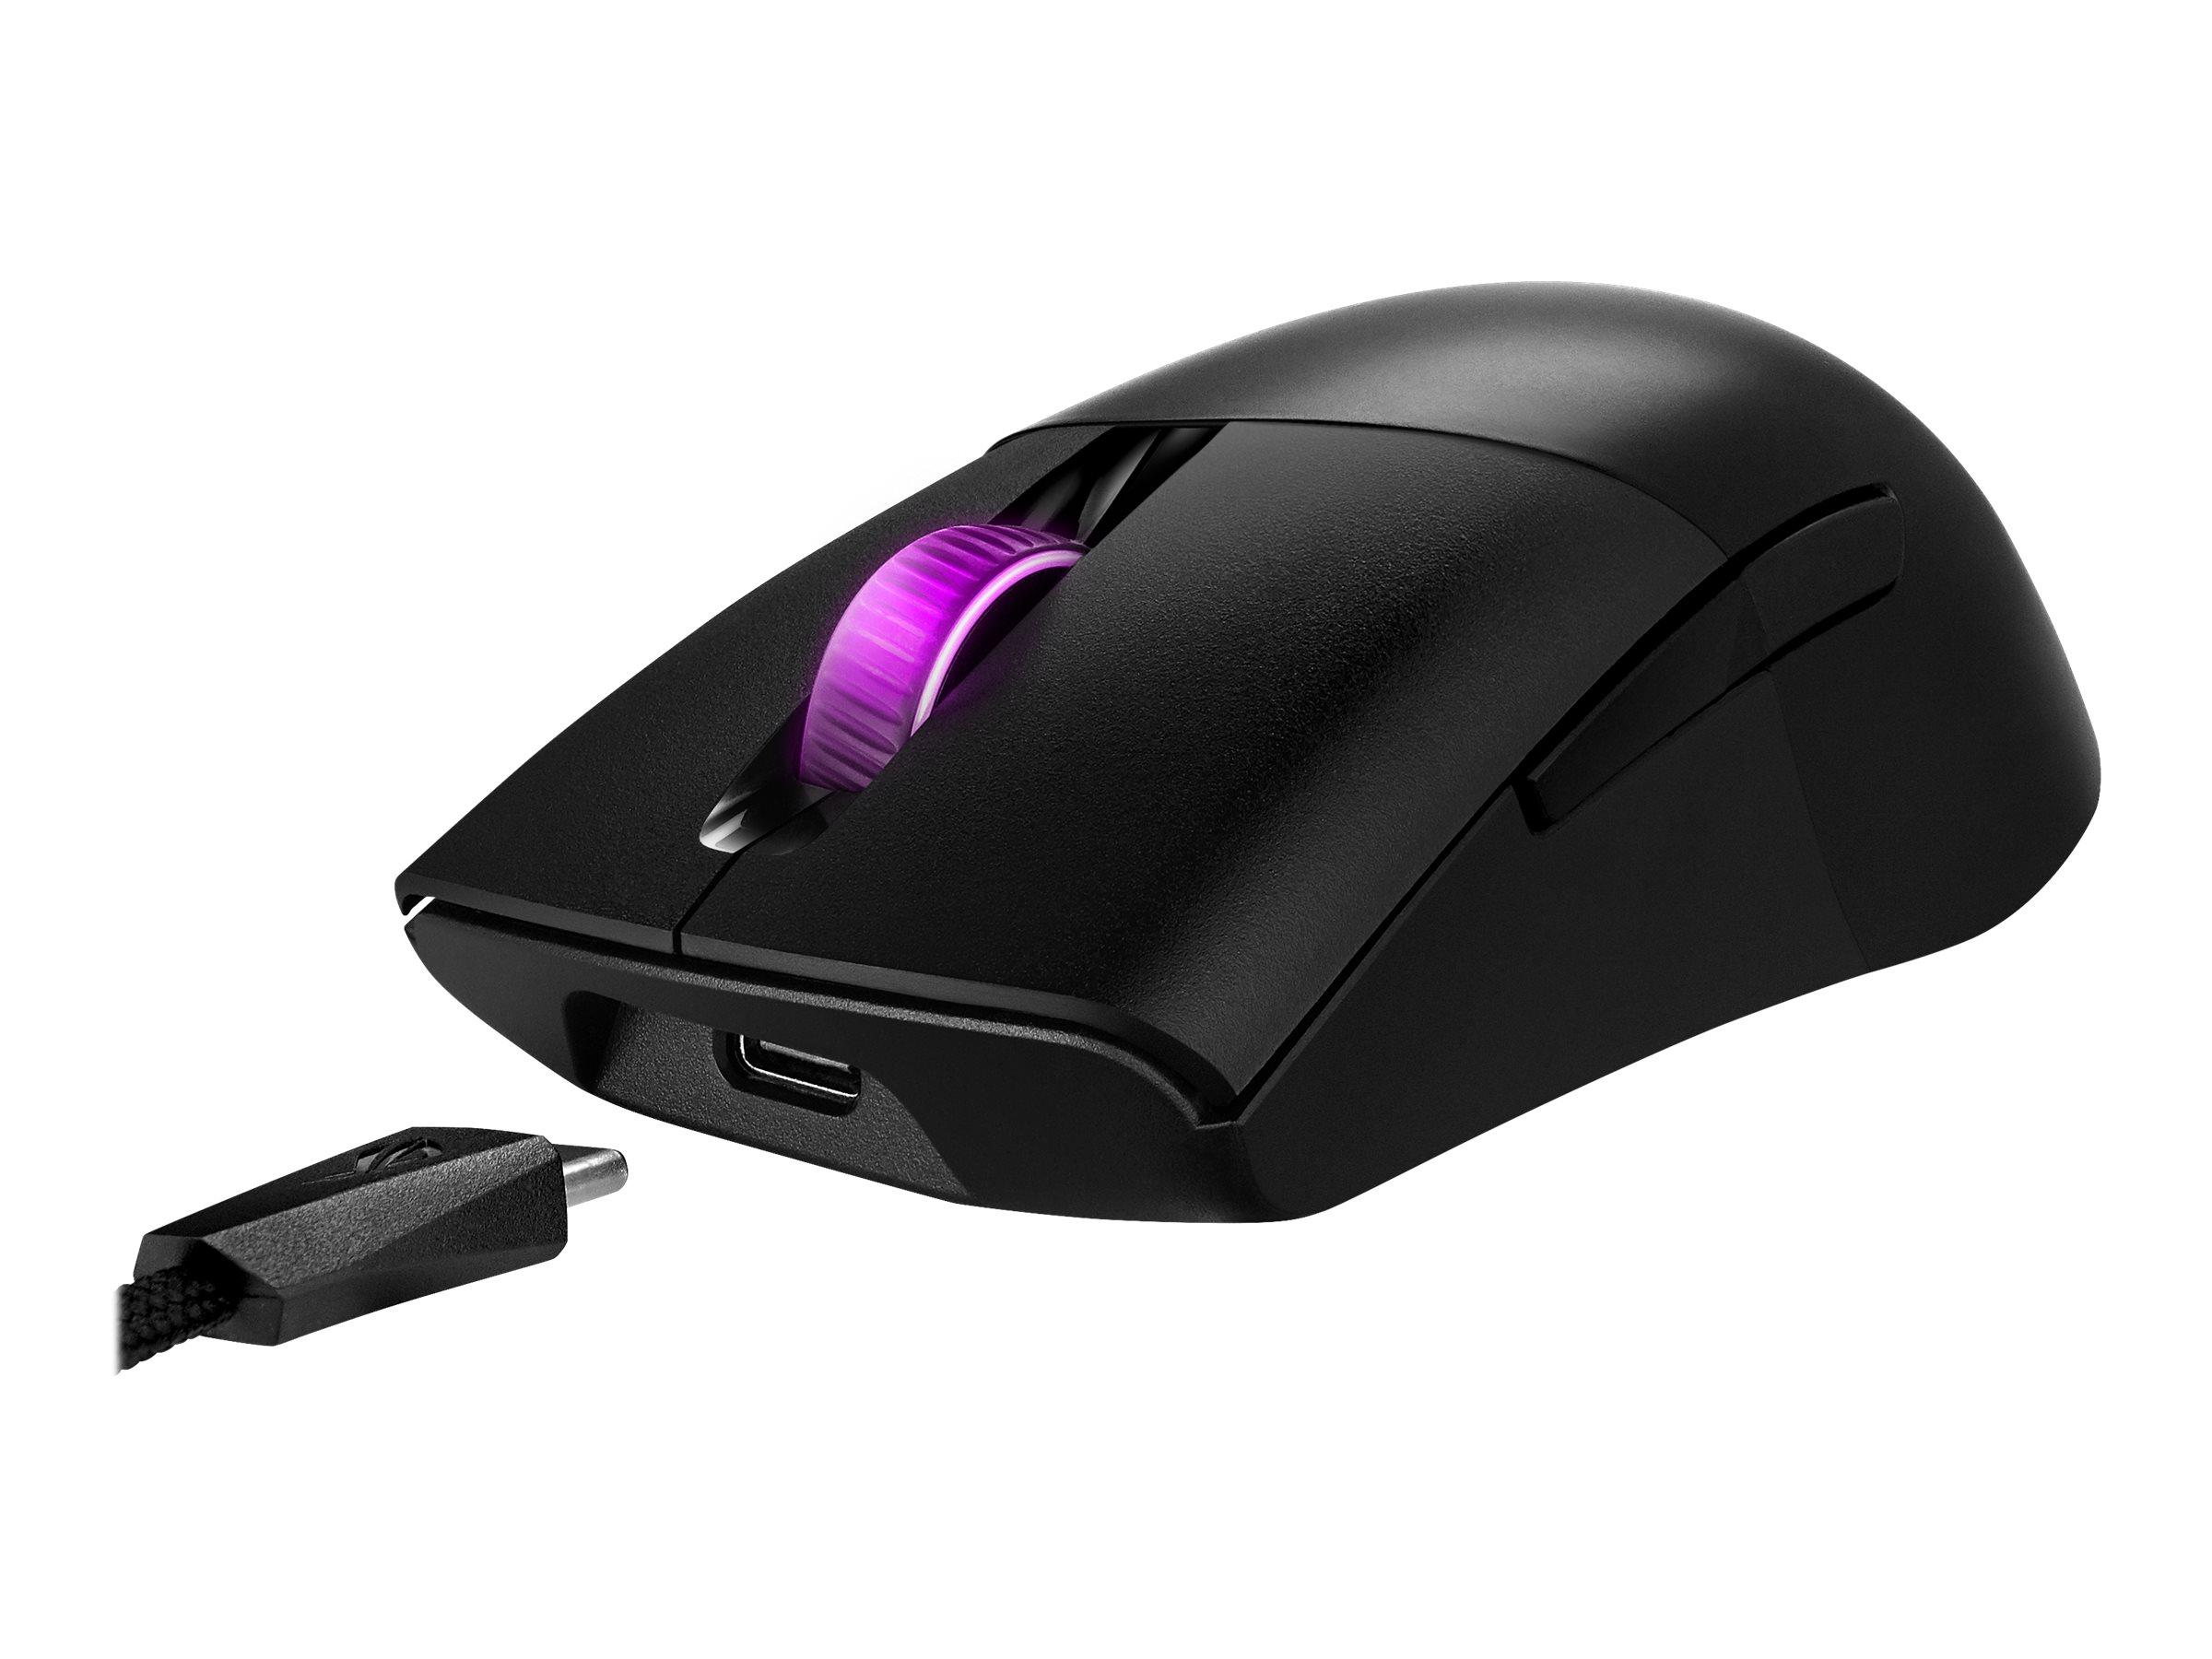 ASUS ROG Keris Wireless - Maus - ergonomisch